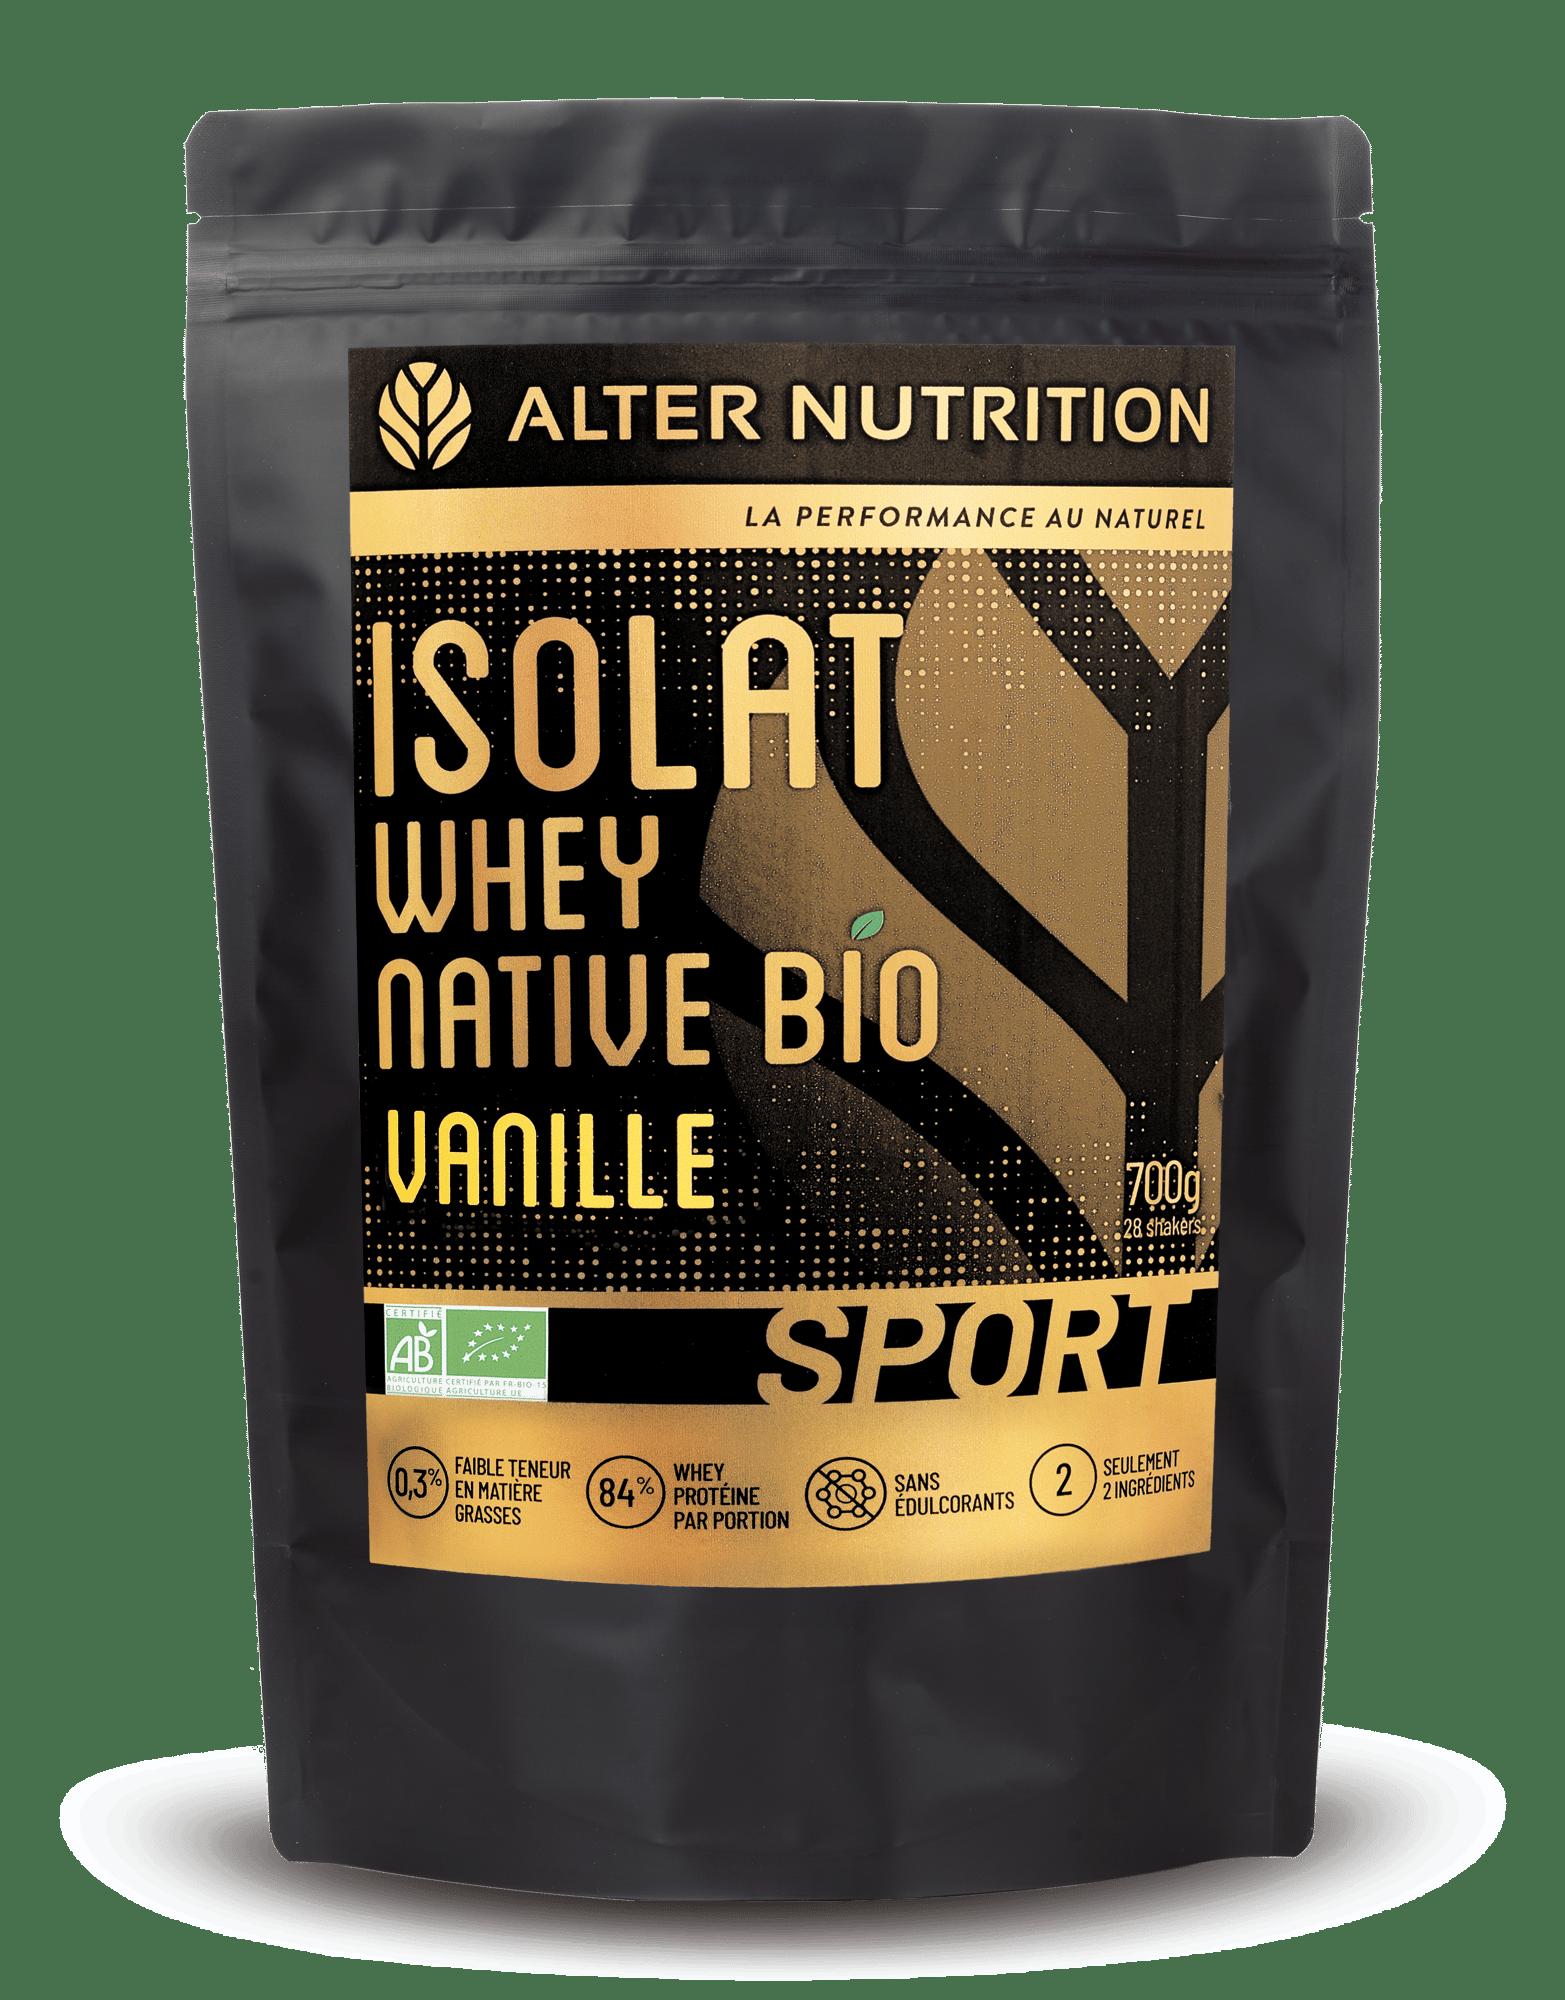 Isolat whey native bio Alter Nutrition